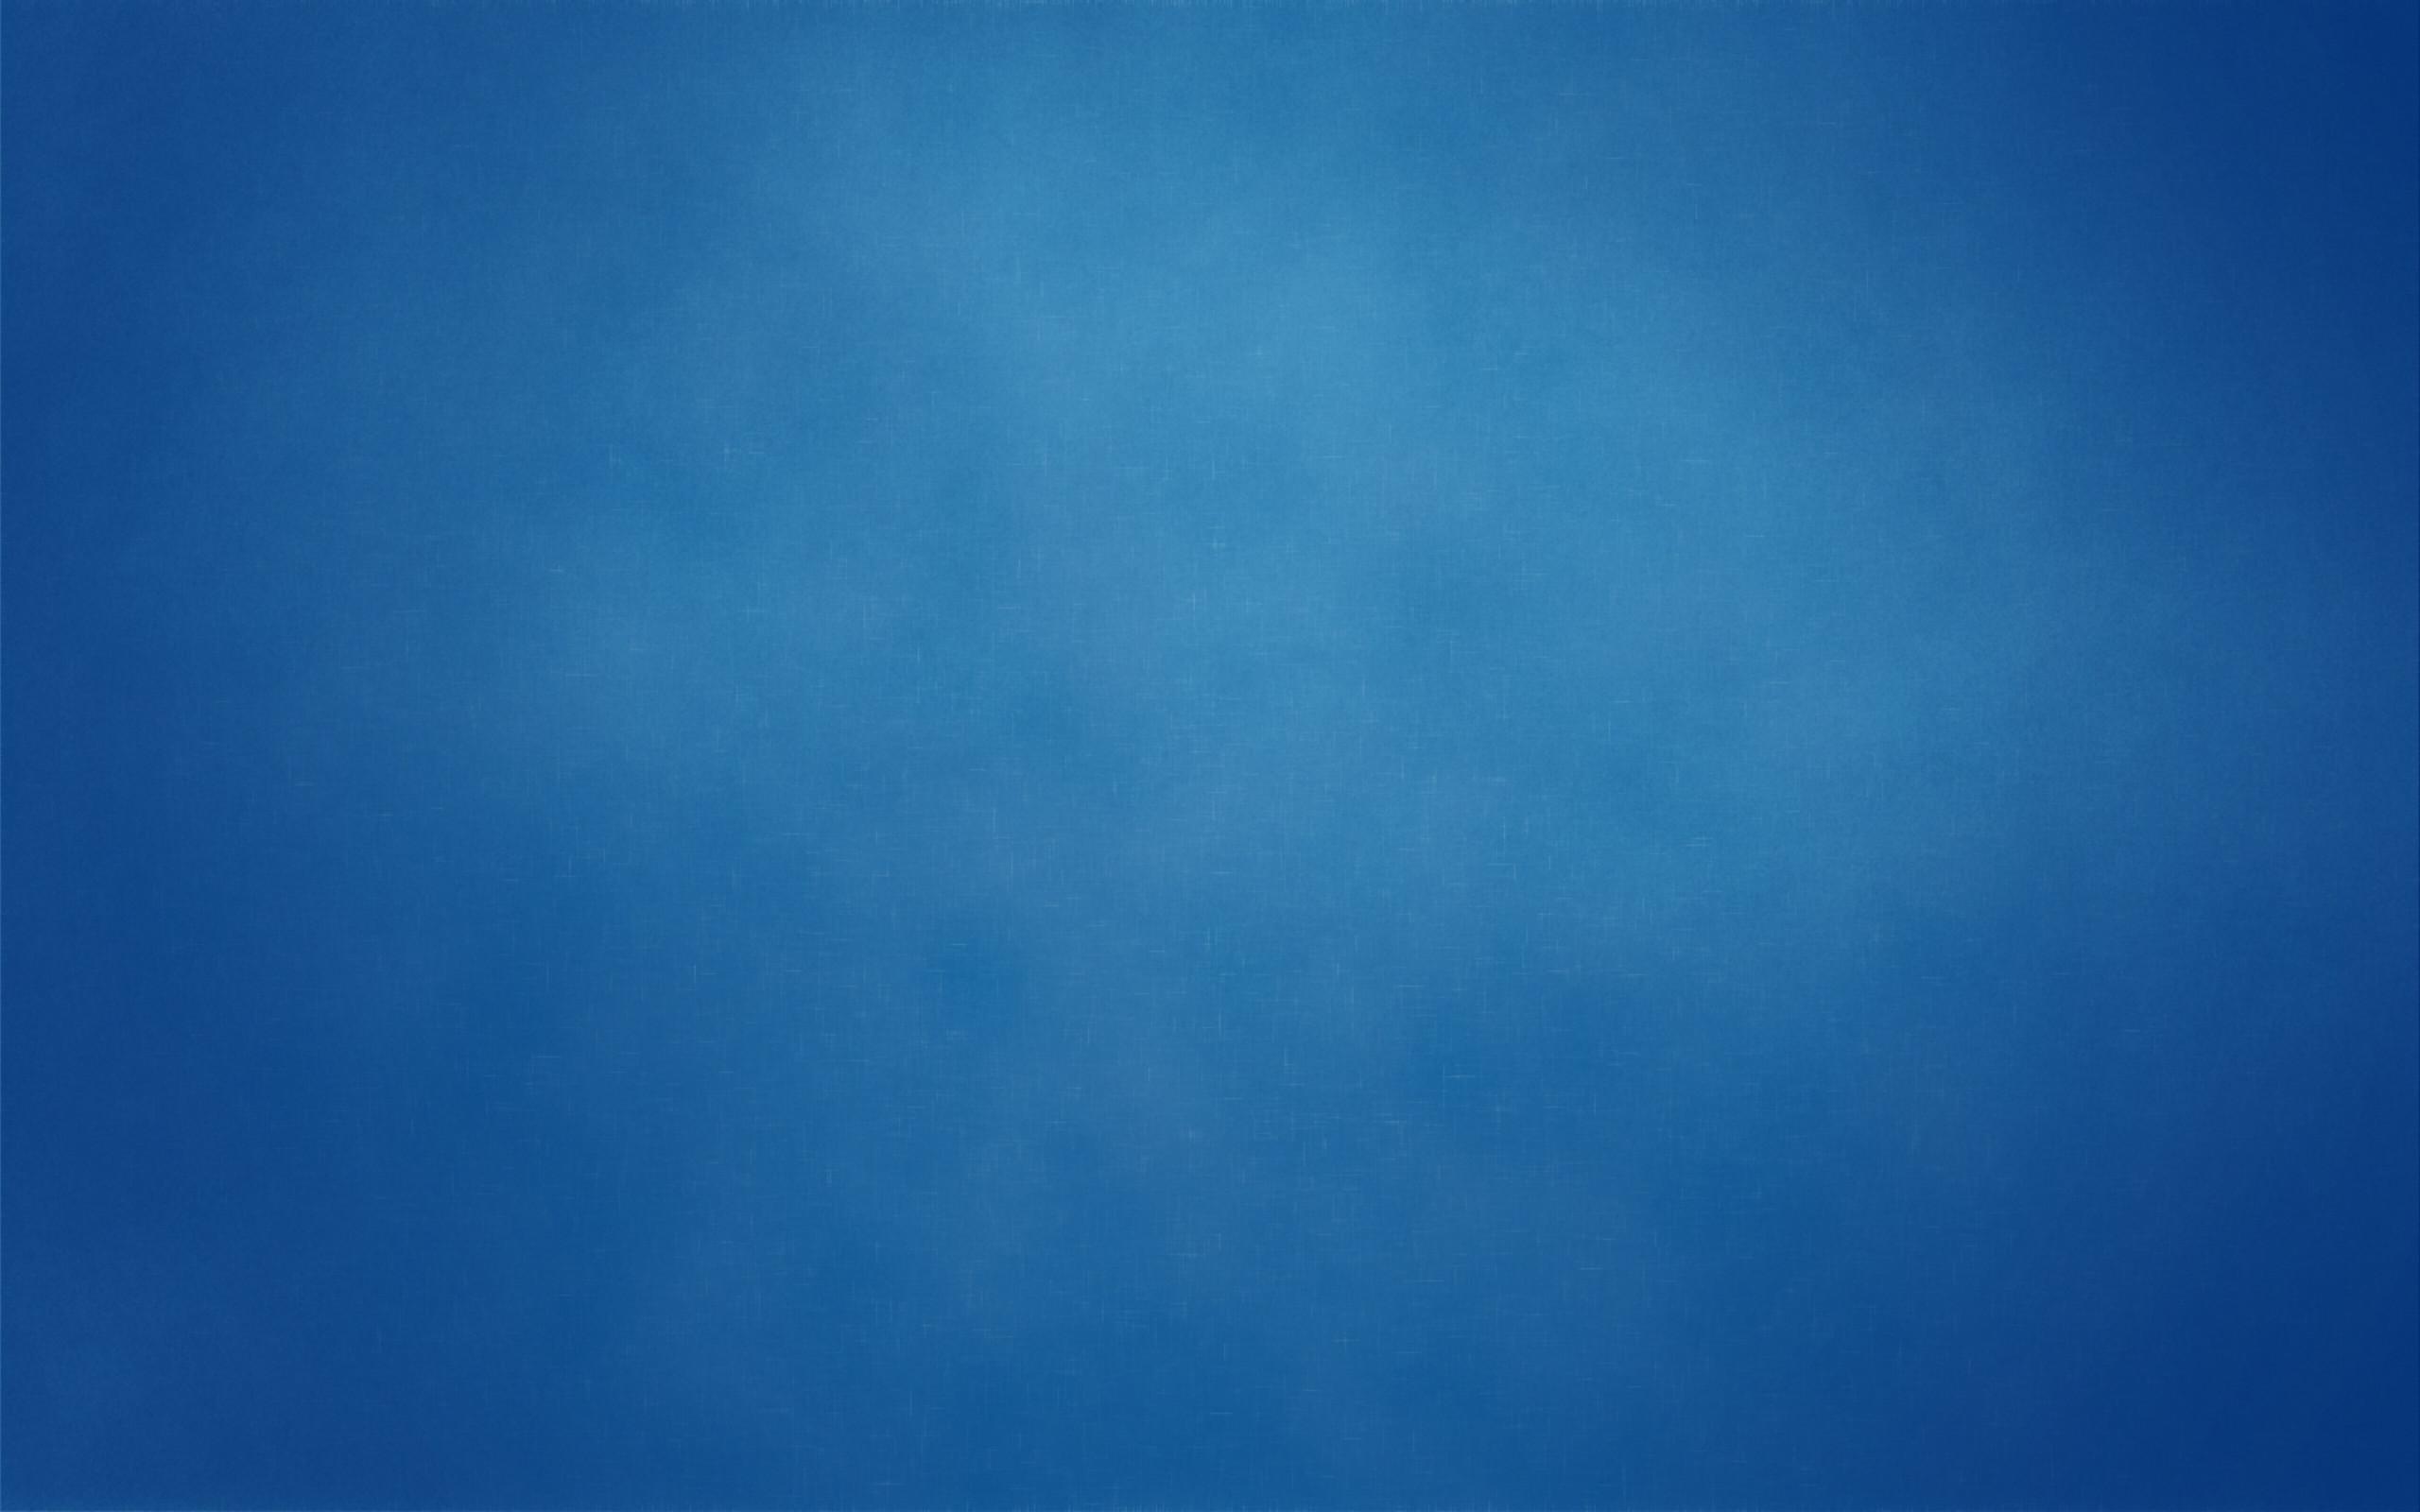 Navy Blue HD Wallpapers Navy Blue HD Wallpaper Navy Blue Backgrounds #7628